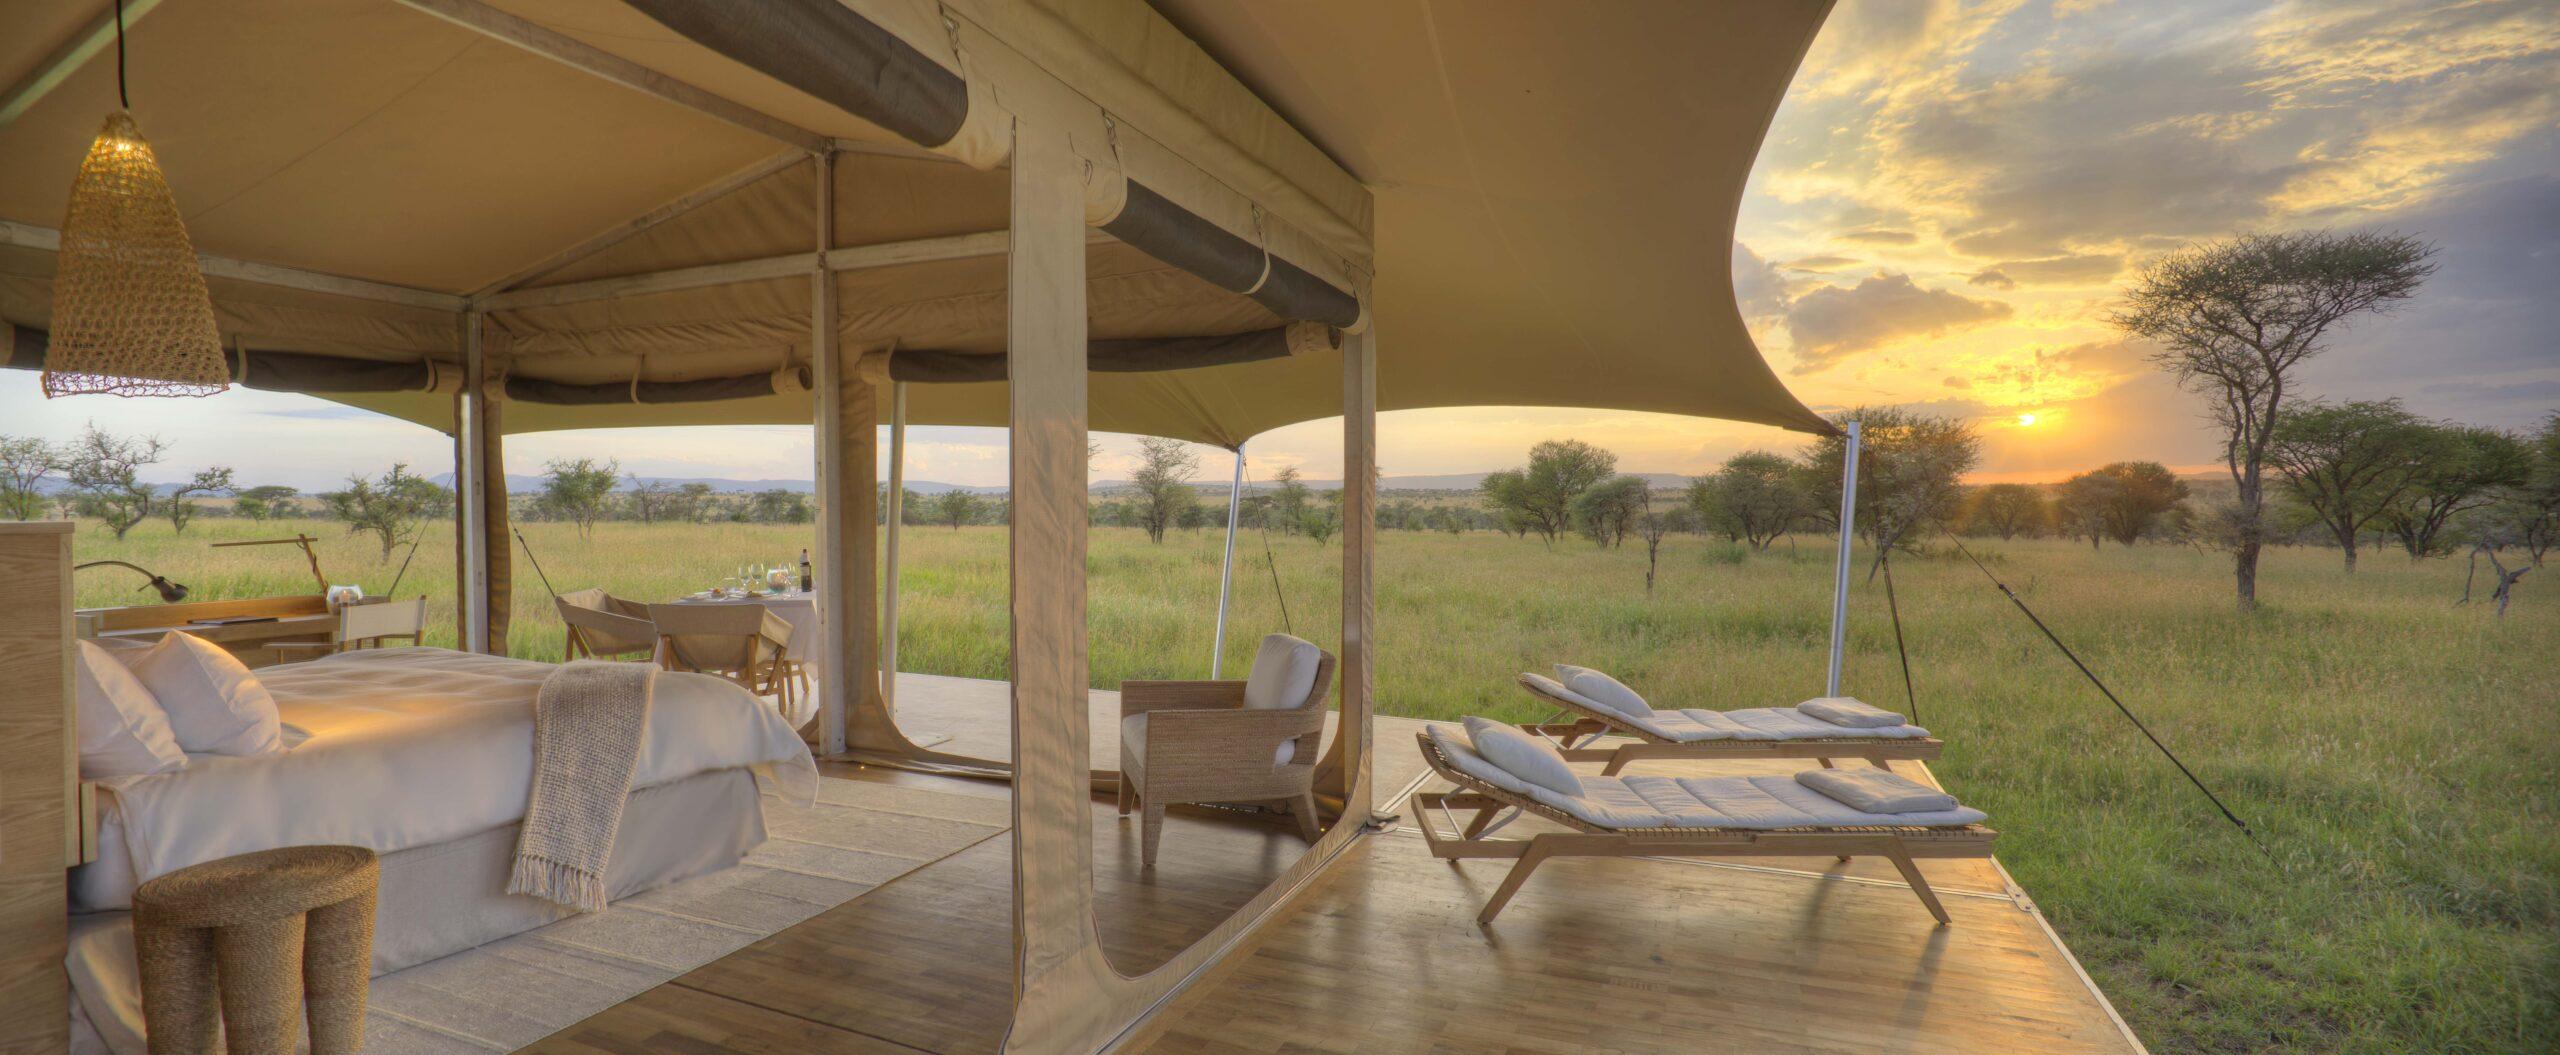 Tents & Luxury Safari Tent - Roving Bushtops | Kenya | Tanzania